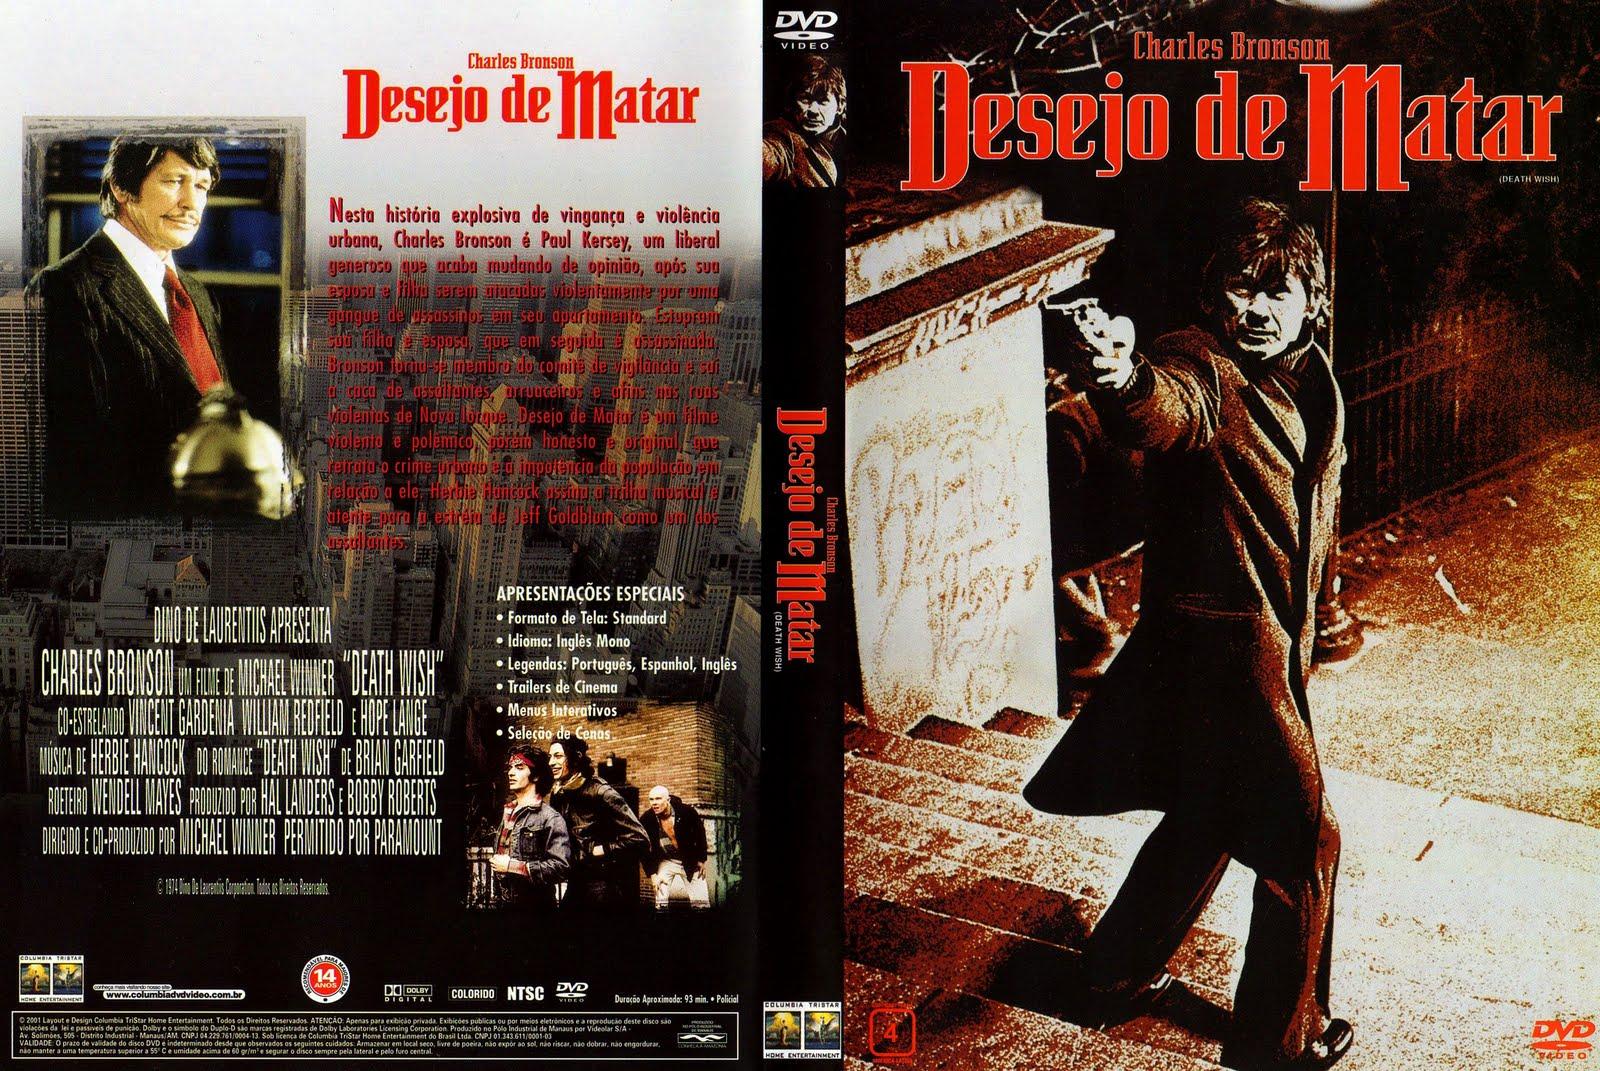 http://1.bp.blogspot.com/_nq4aW-oL_Fg/Sw66Qy0tDDI/AAAAAAAAAXY/SAvJehcUgLk/s1600/Desejo+De+Matar.jpg